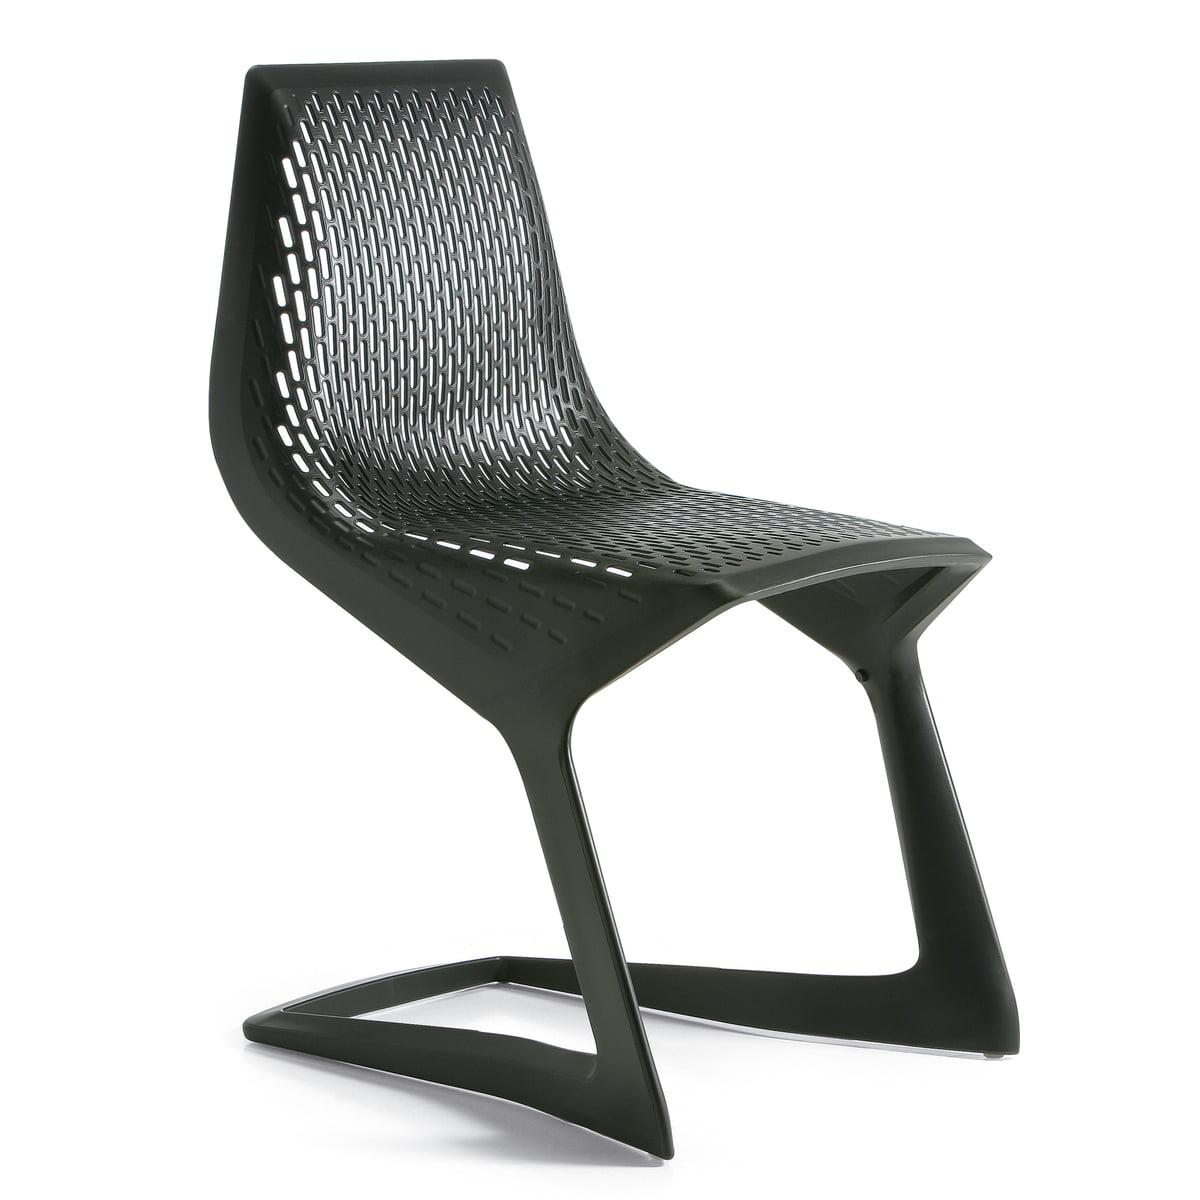 myto chair plank shop. Black Bedroom Furniture Sets. Home Design Ideas